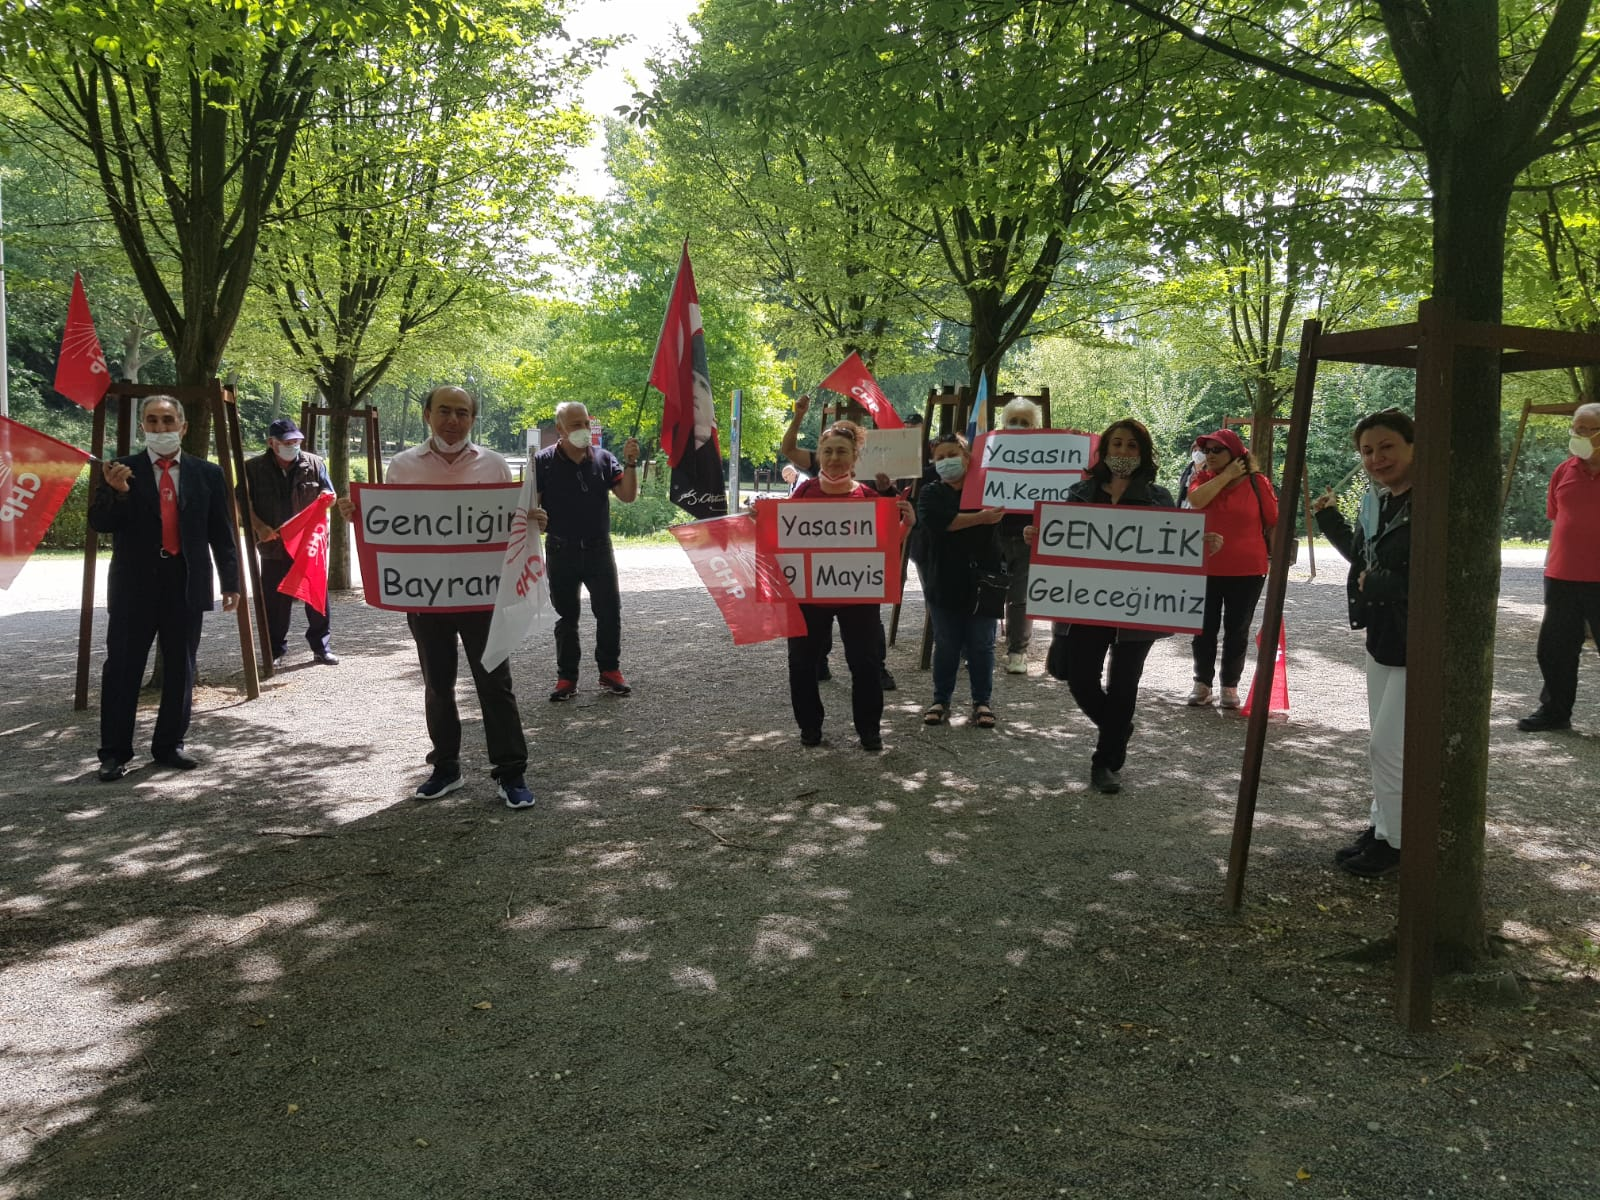 CHP NRW Birliği 19 Mayıs'ı kutladı